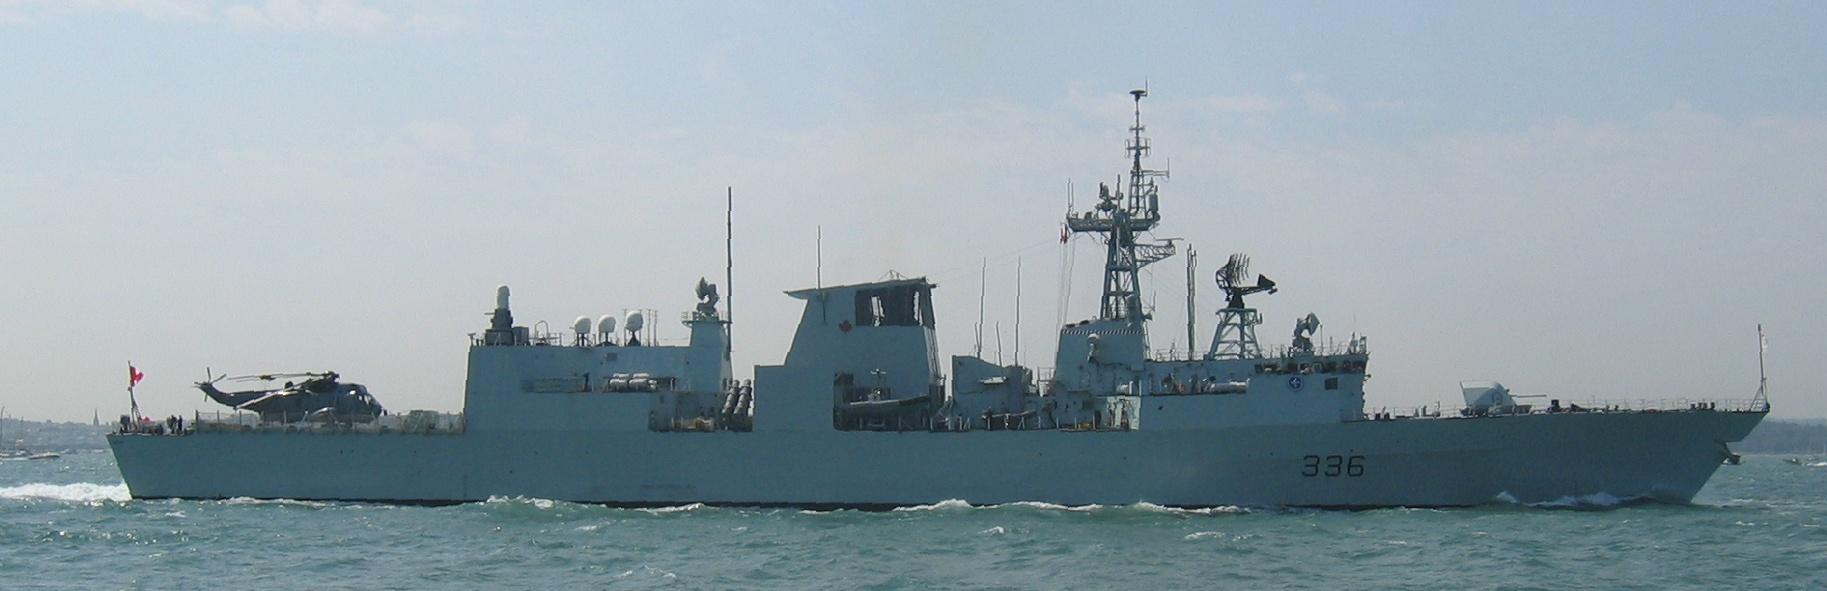 HMCS Montreal FFH336.jpg